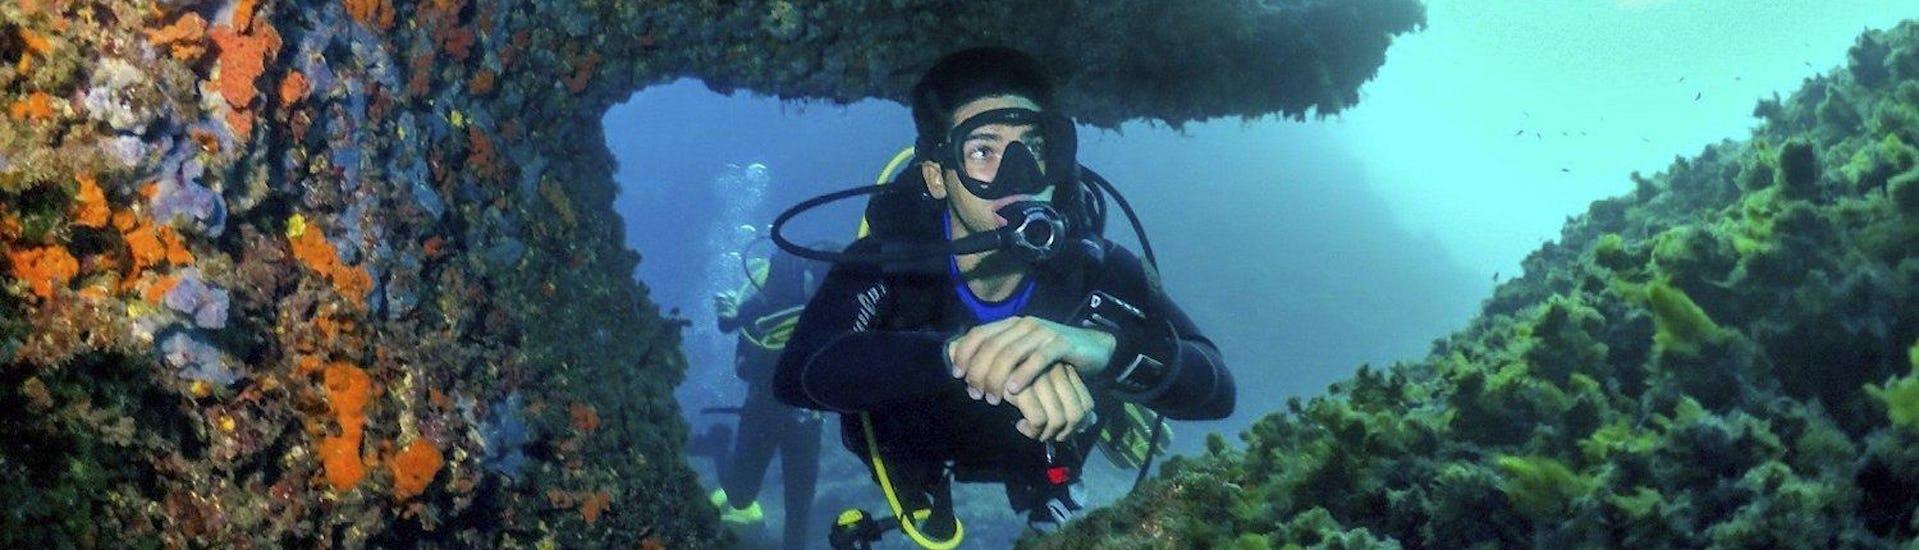 Scuba Diving Course for Beginners - PADI Scuba Diver